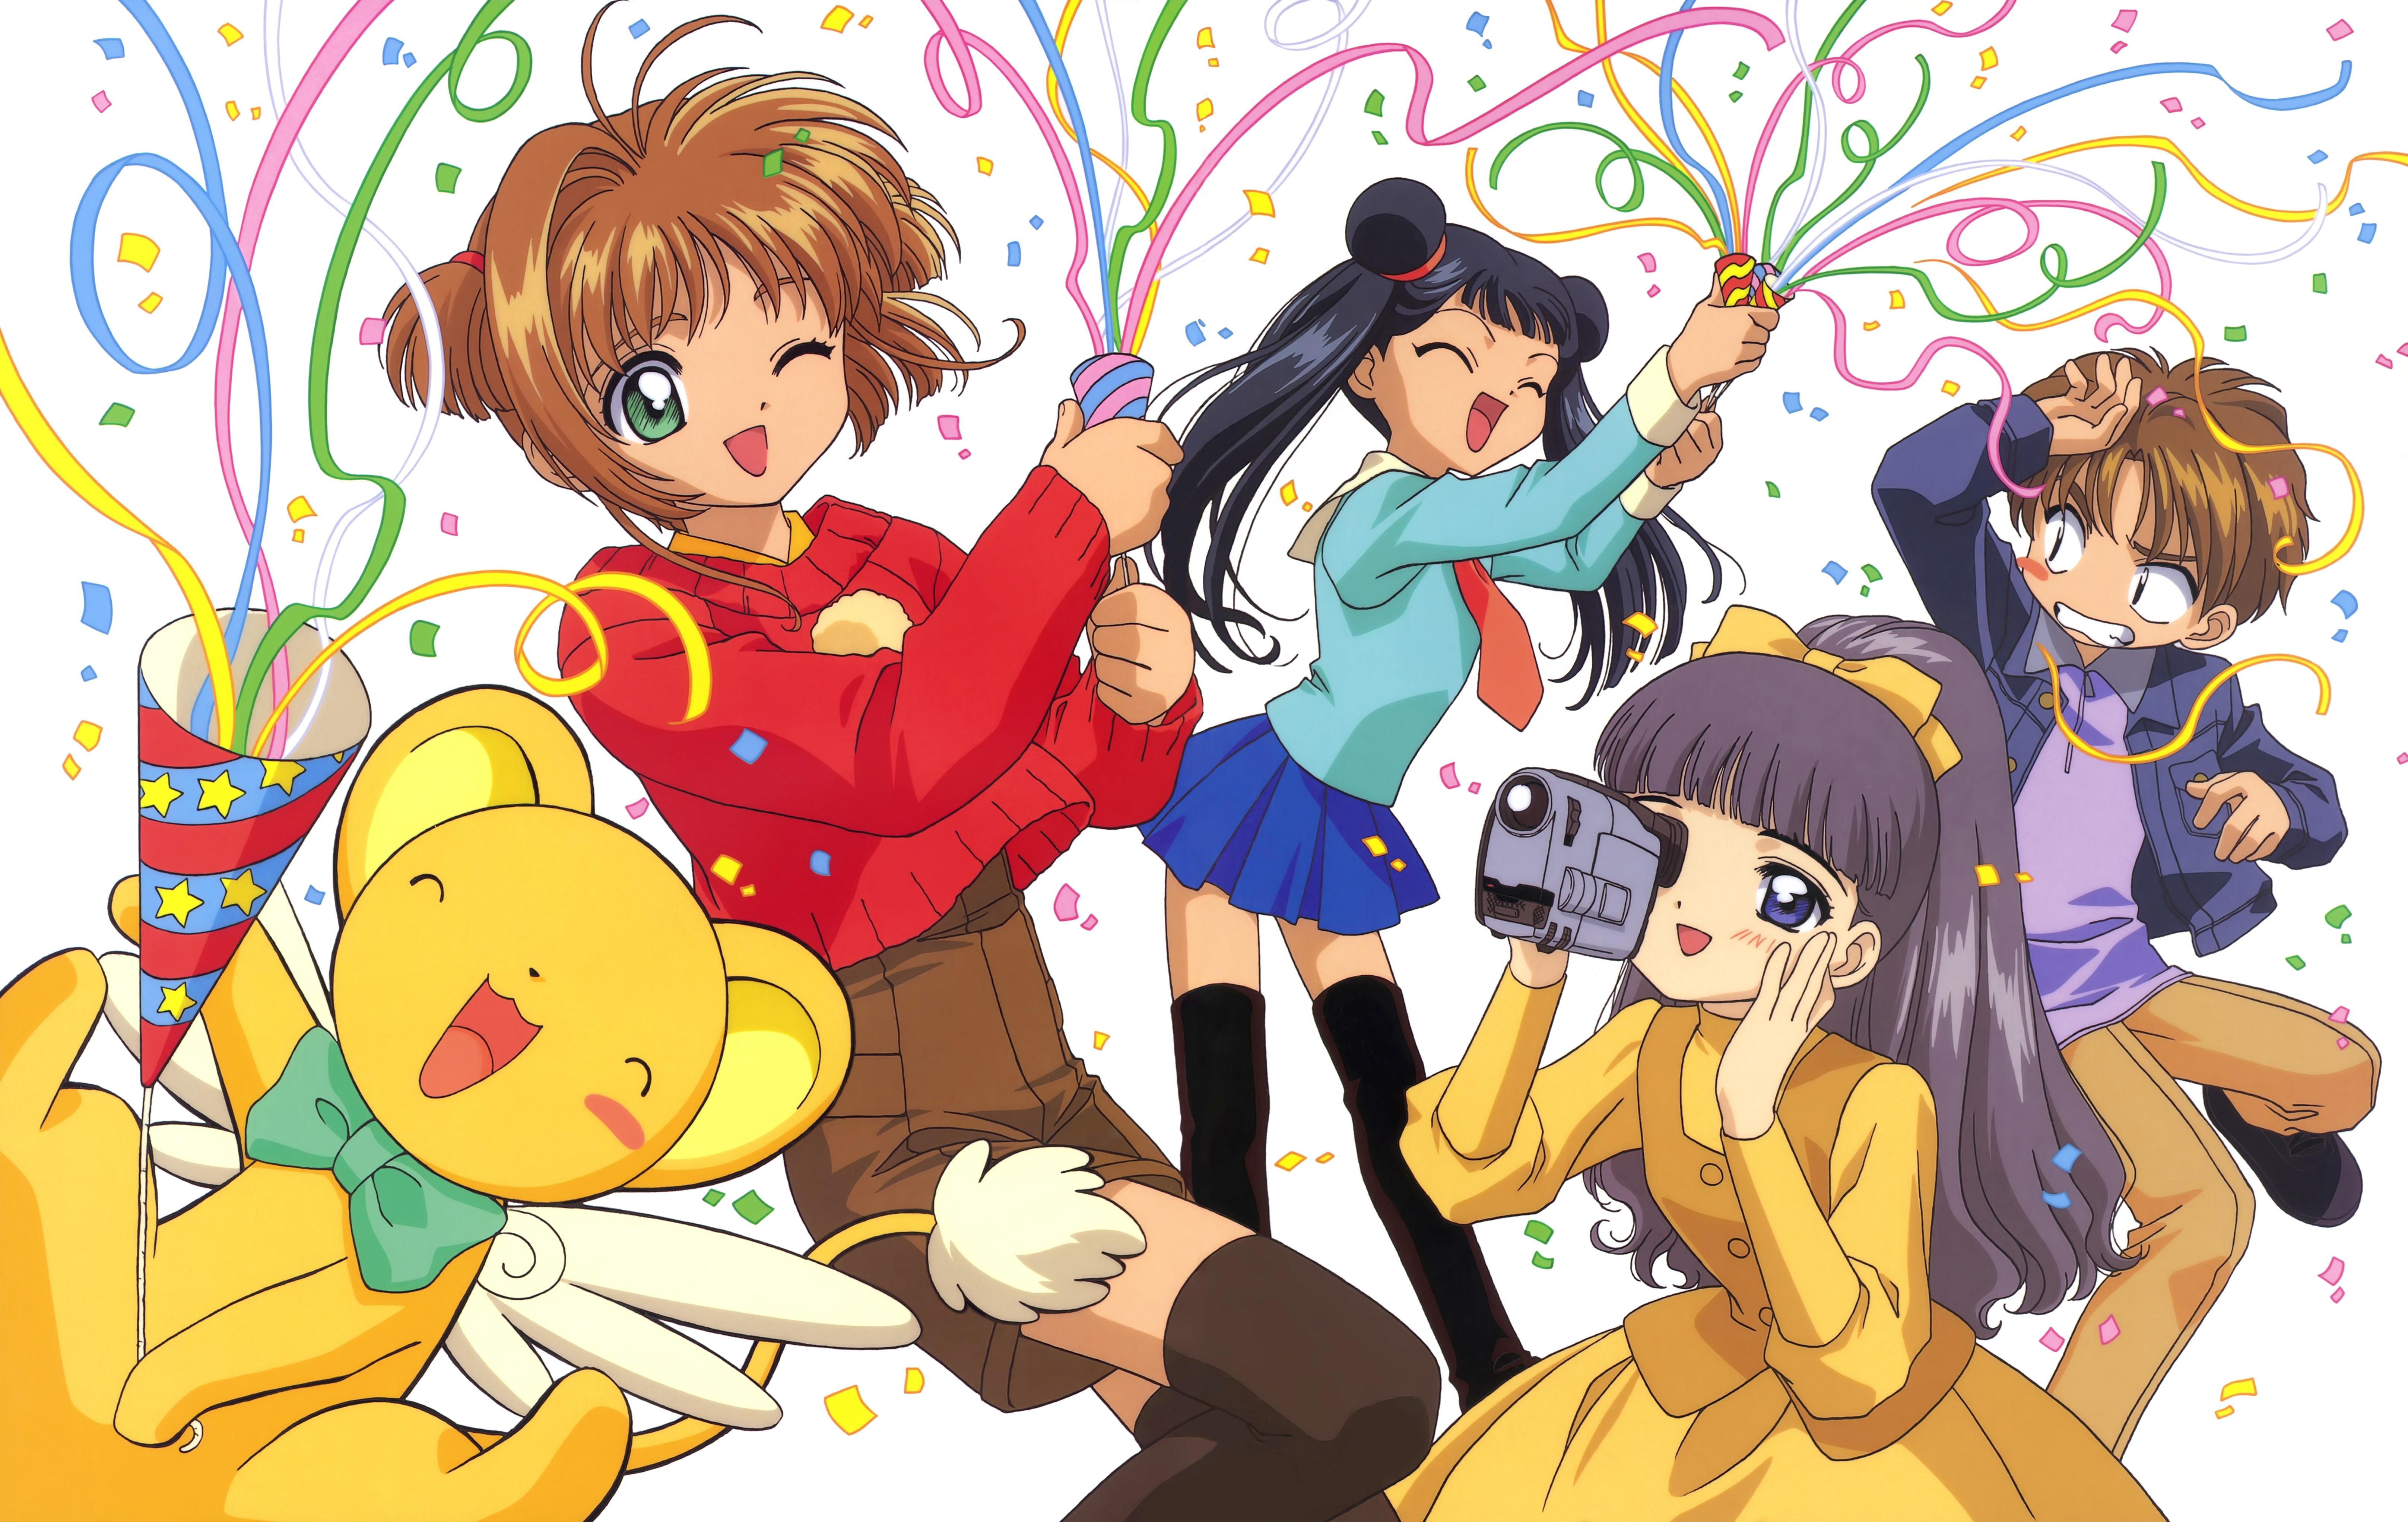 Manga Sakura Cardcaptor Set 4 # 02,03,04,10 Envio